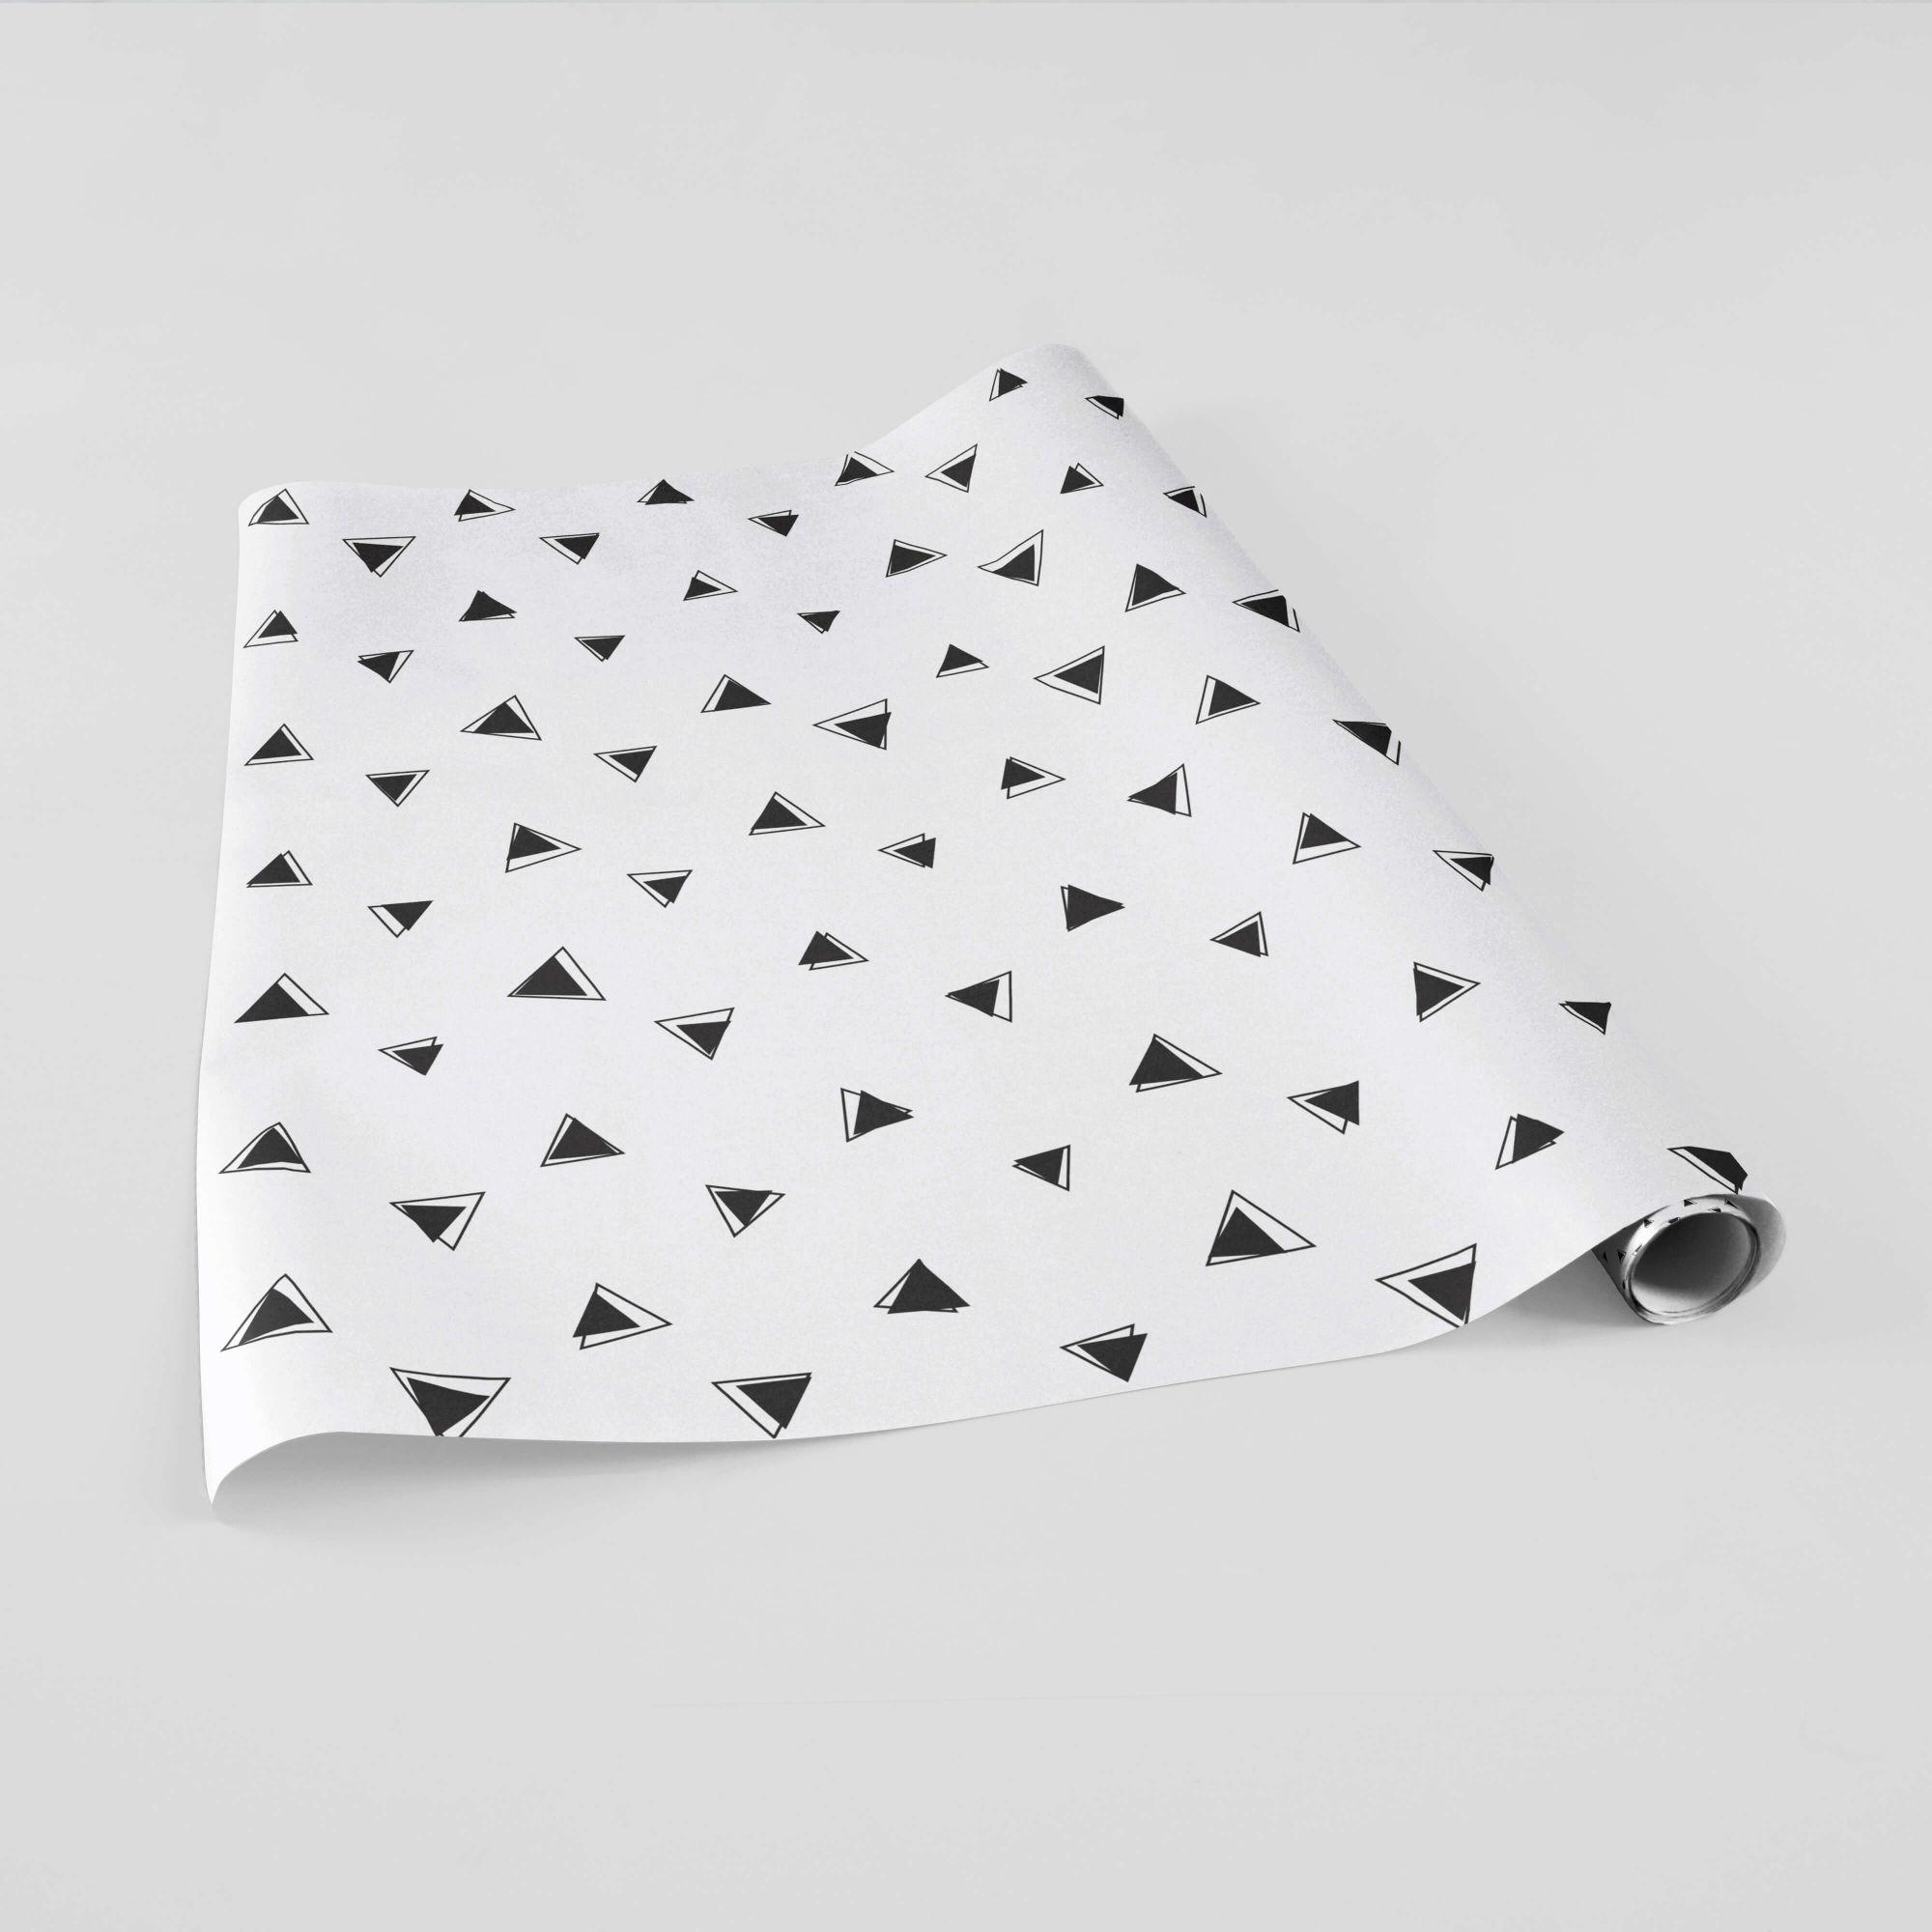 Papel de Parede Adesivo Triângulos Divertidos Preto e Branco